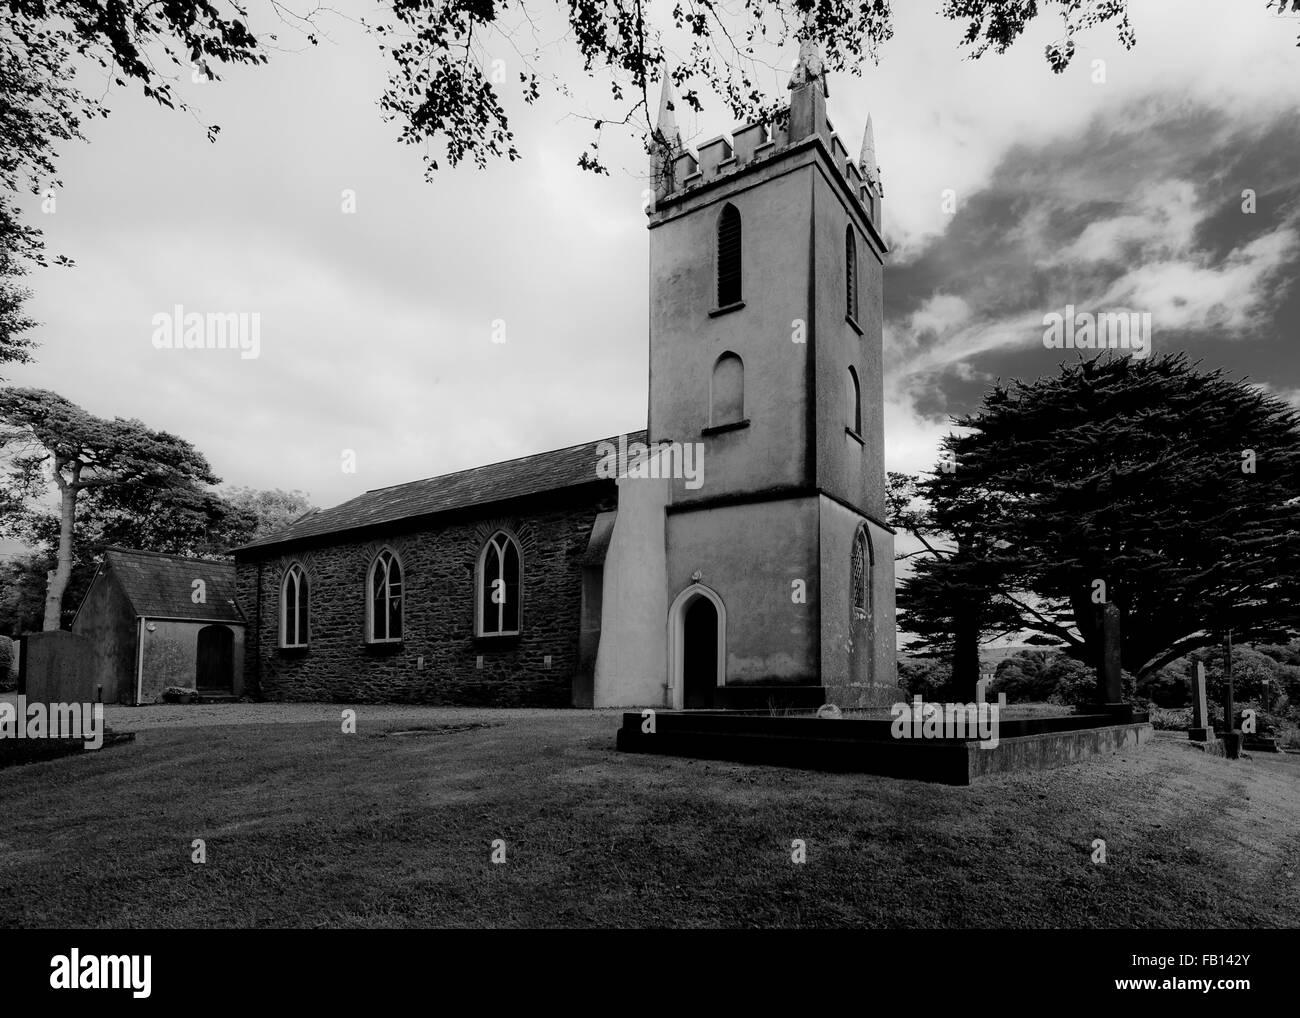 St. James Church, Durrus, West Cork, Ireland. - Stock Image